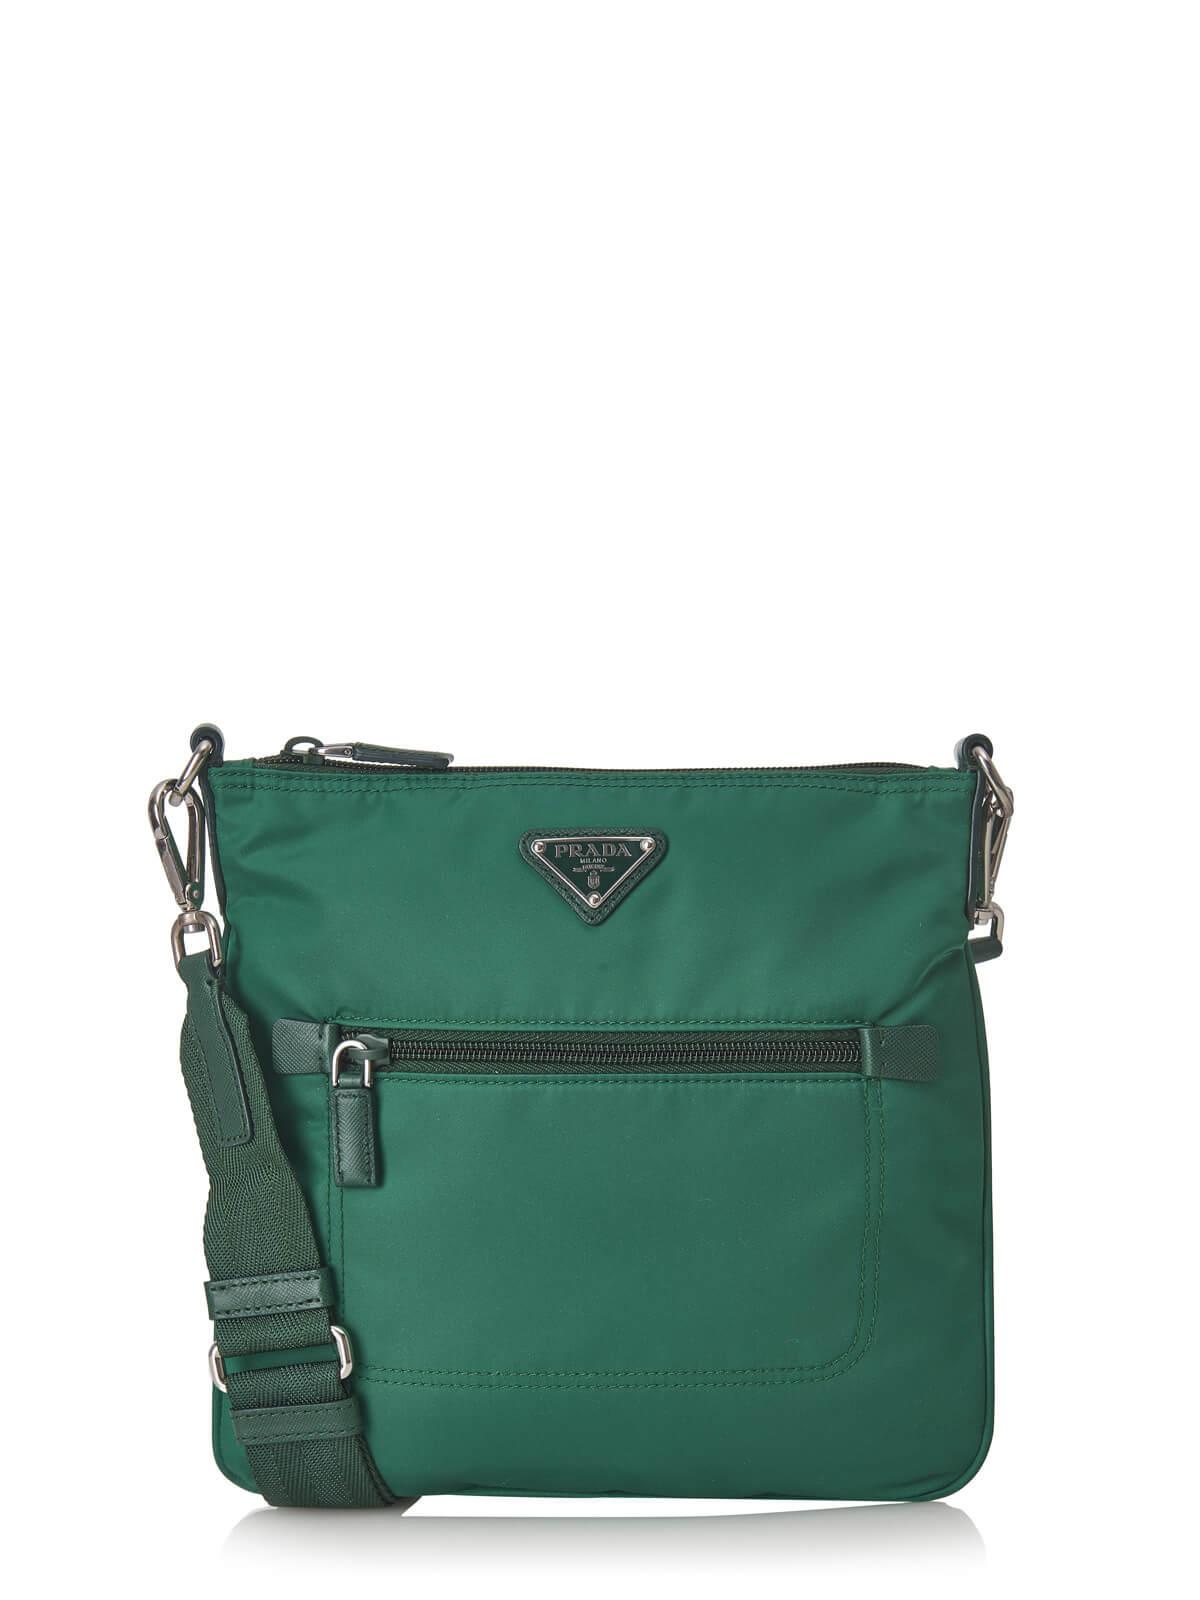 4d20207bae ... clearance prada bag bandoliera bt0716 fashionesta online shop 55013  97a5a